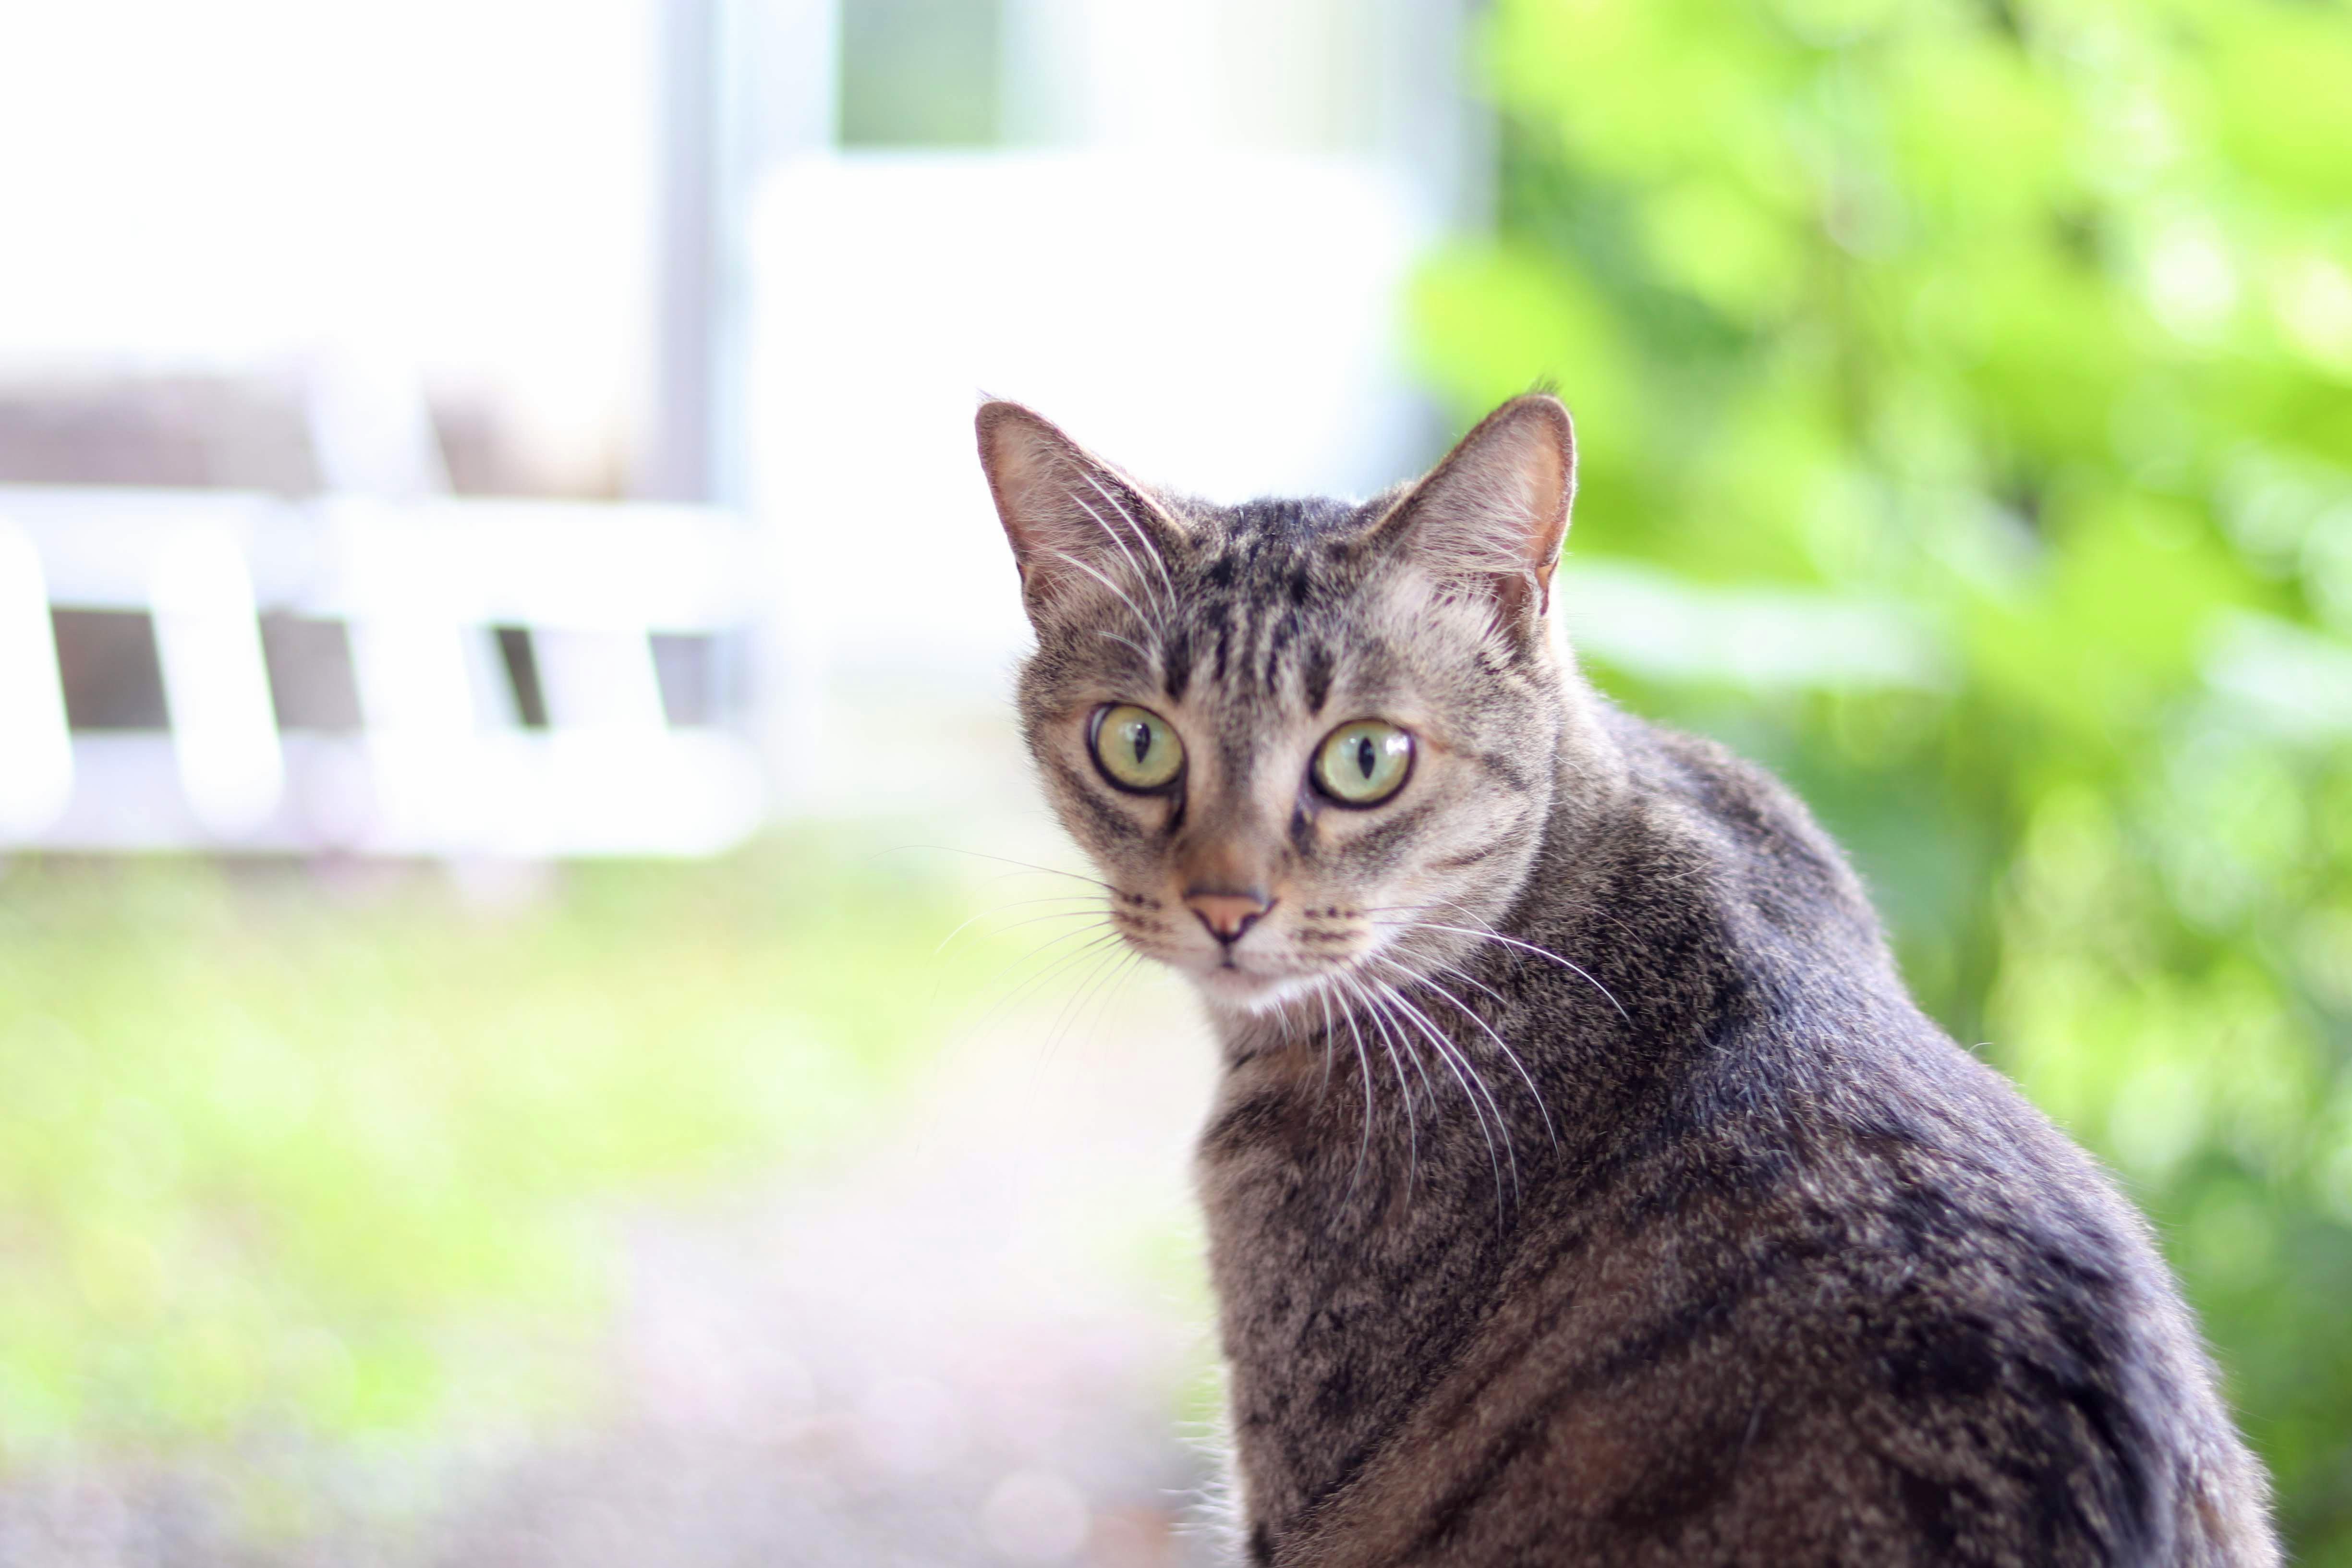 CAT(ネコ):photo by SHUN ONLINE(2019年8月14日)